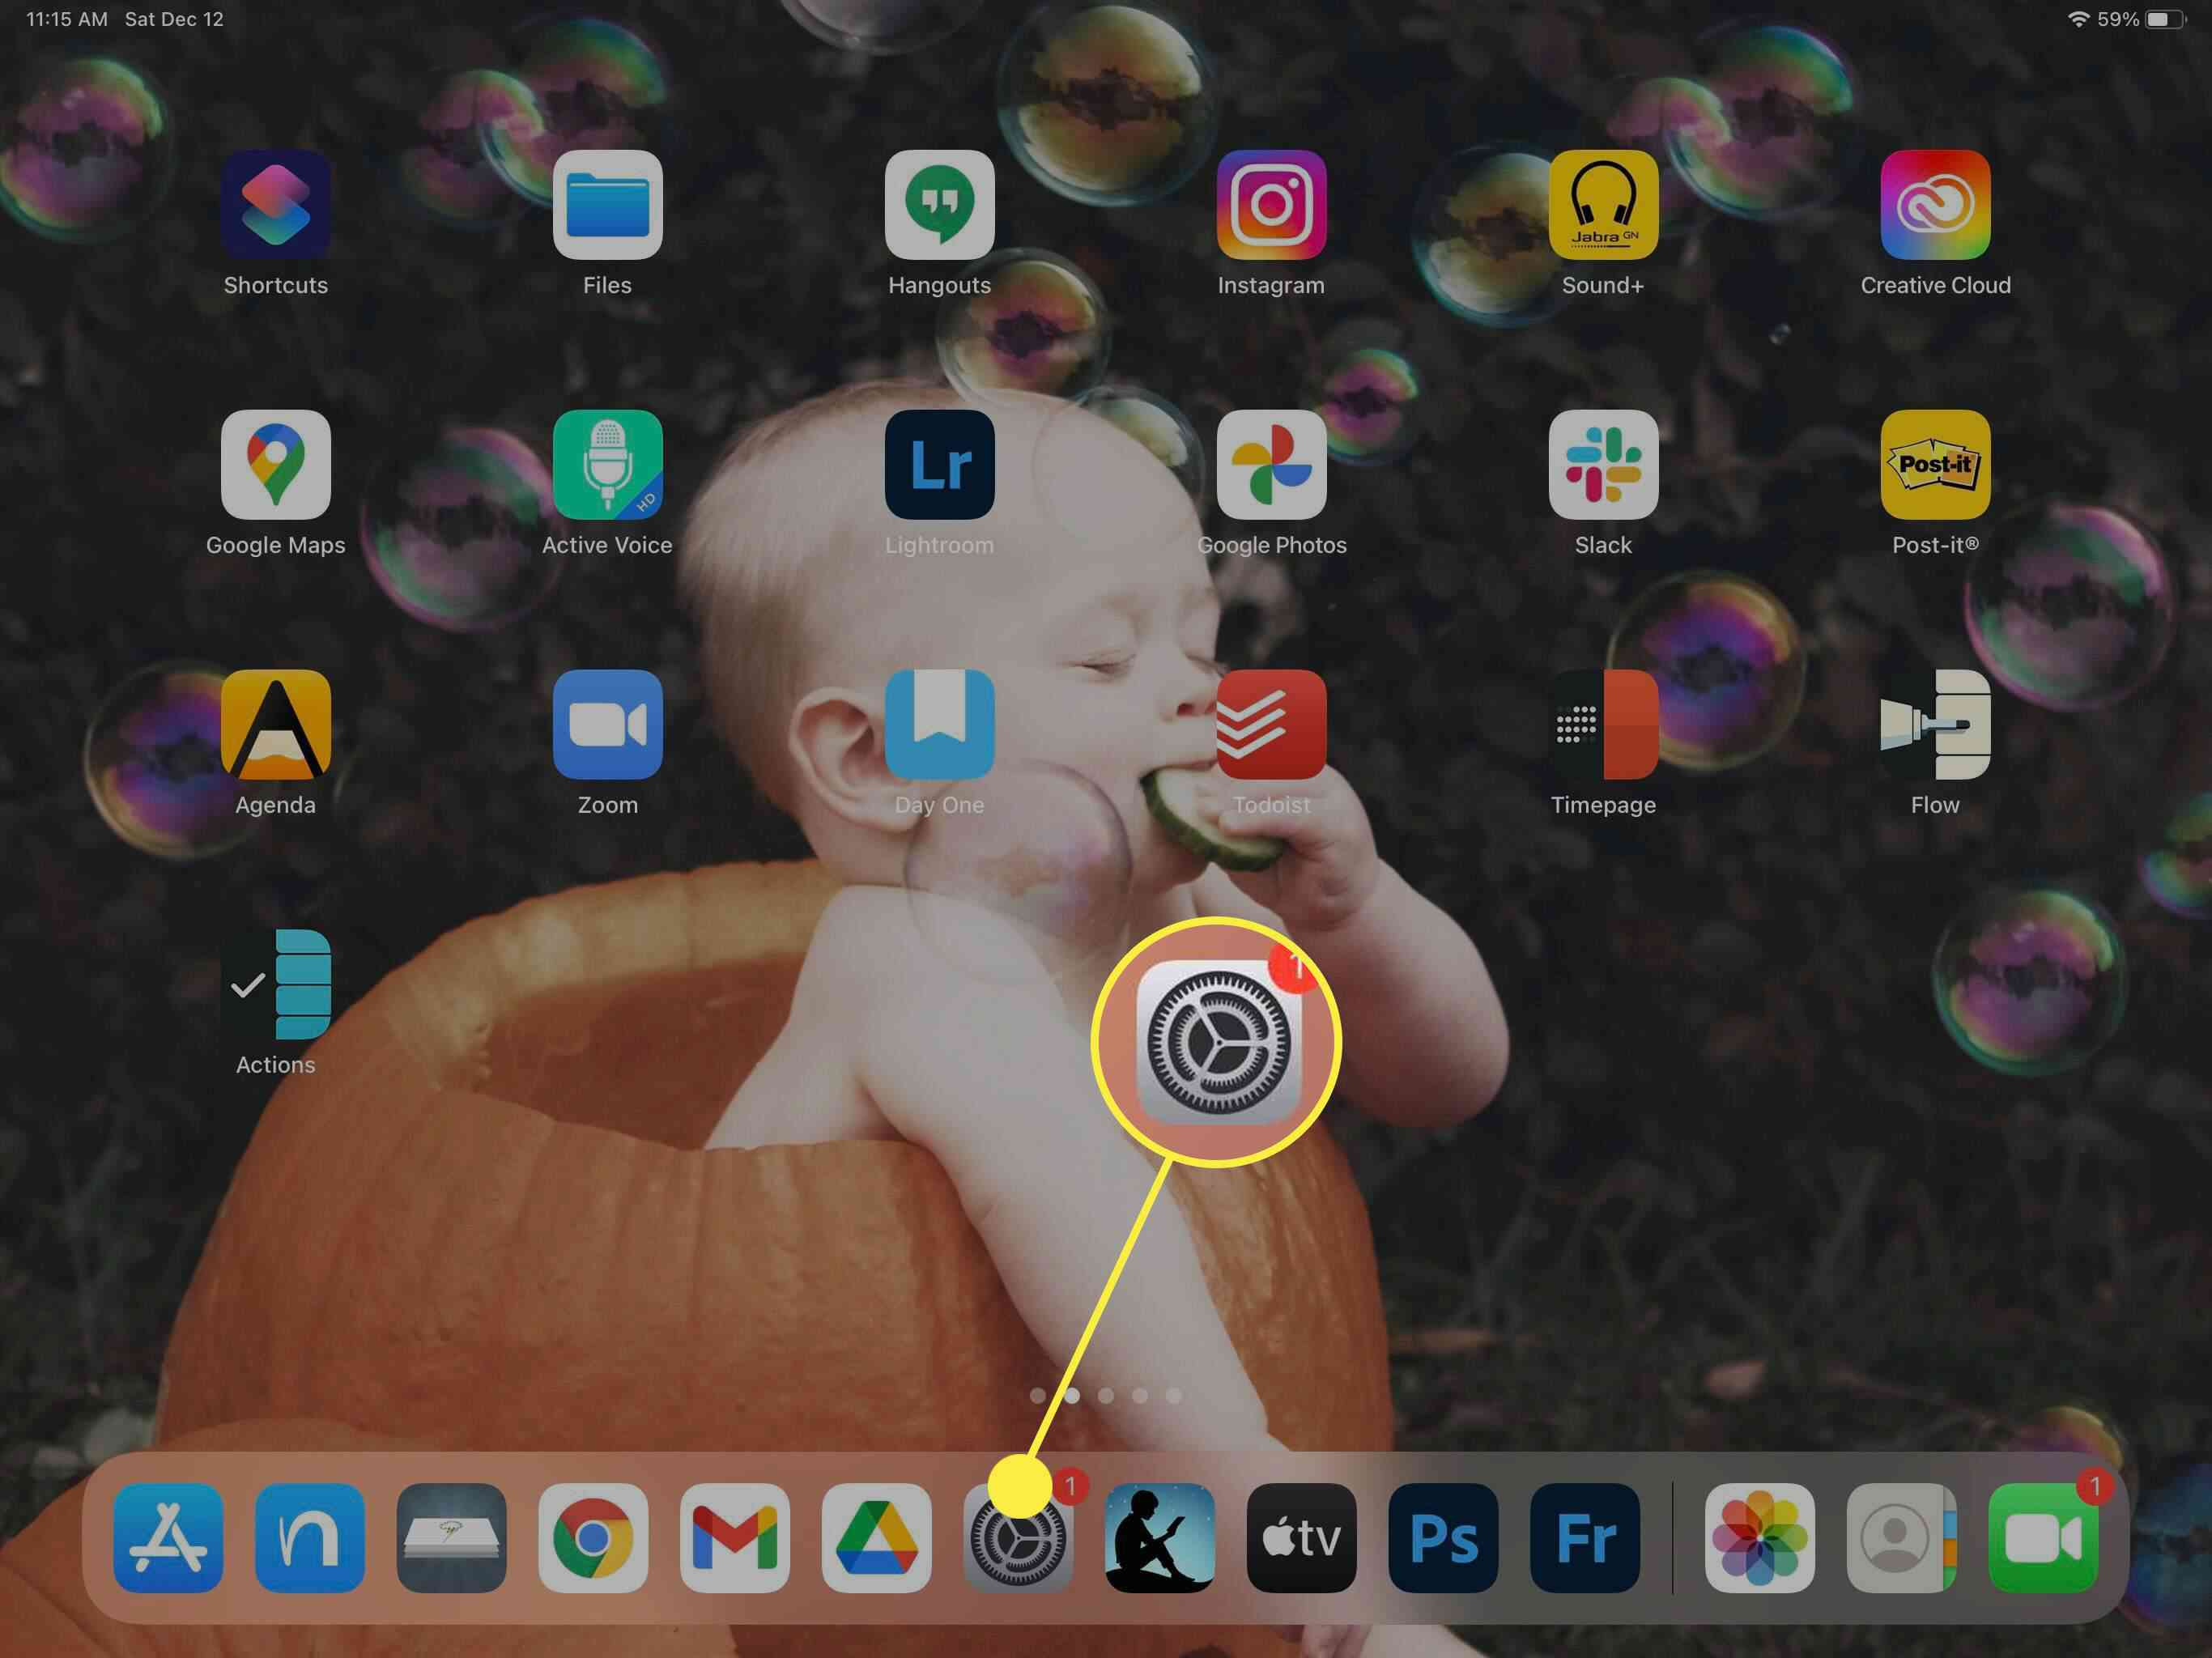 Screenshot showing the Settings app on iPad.